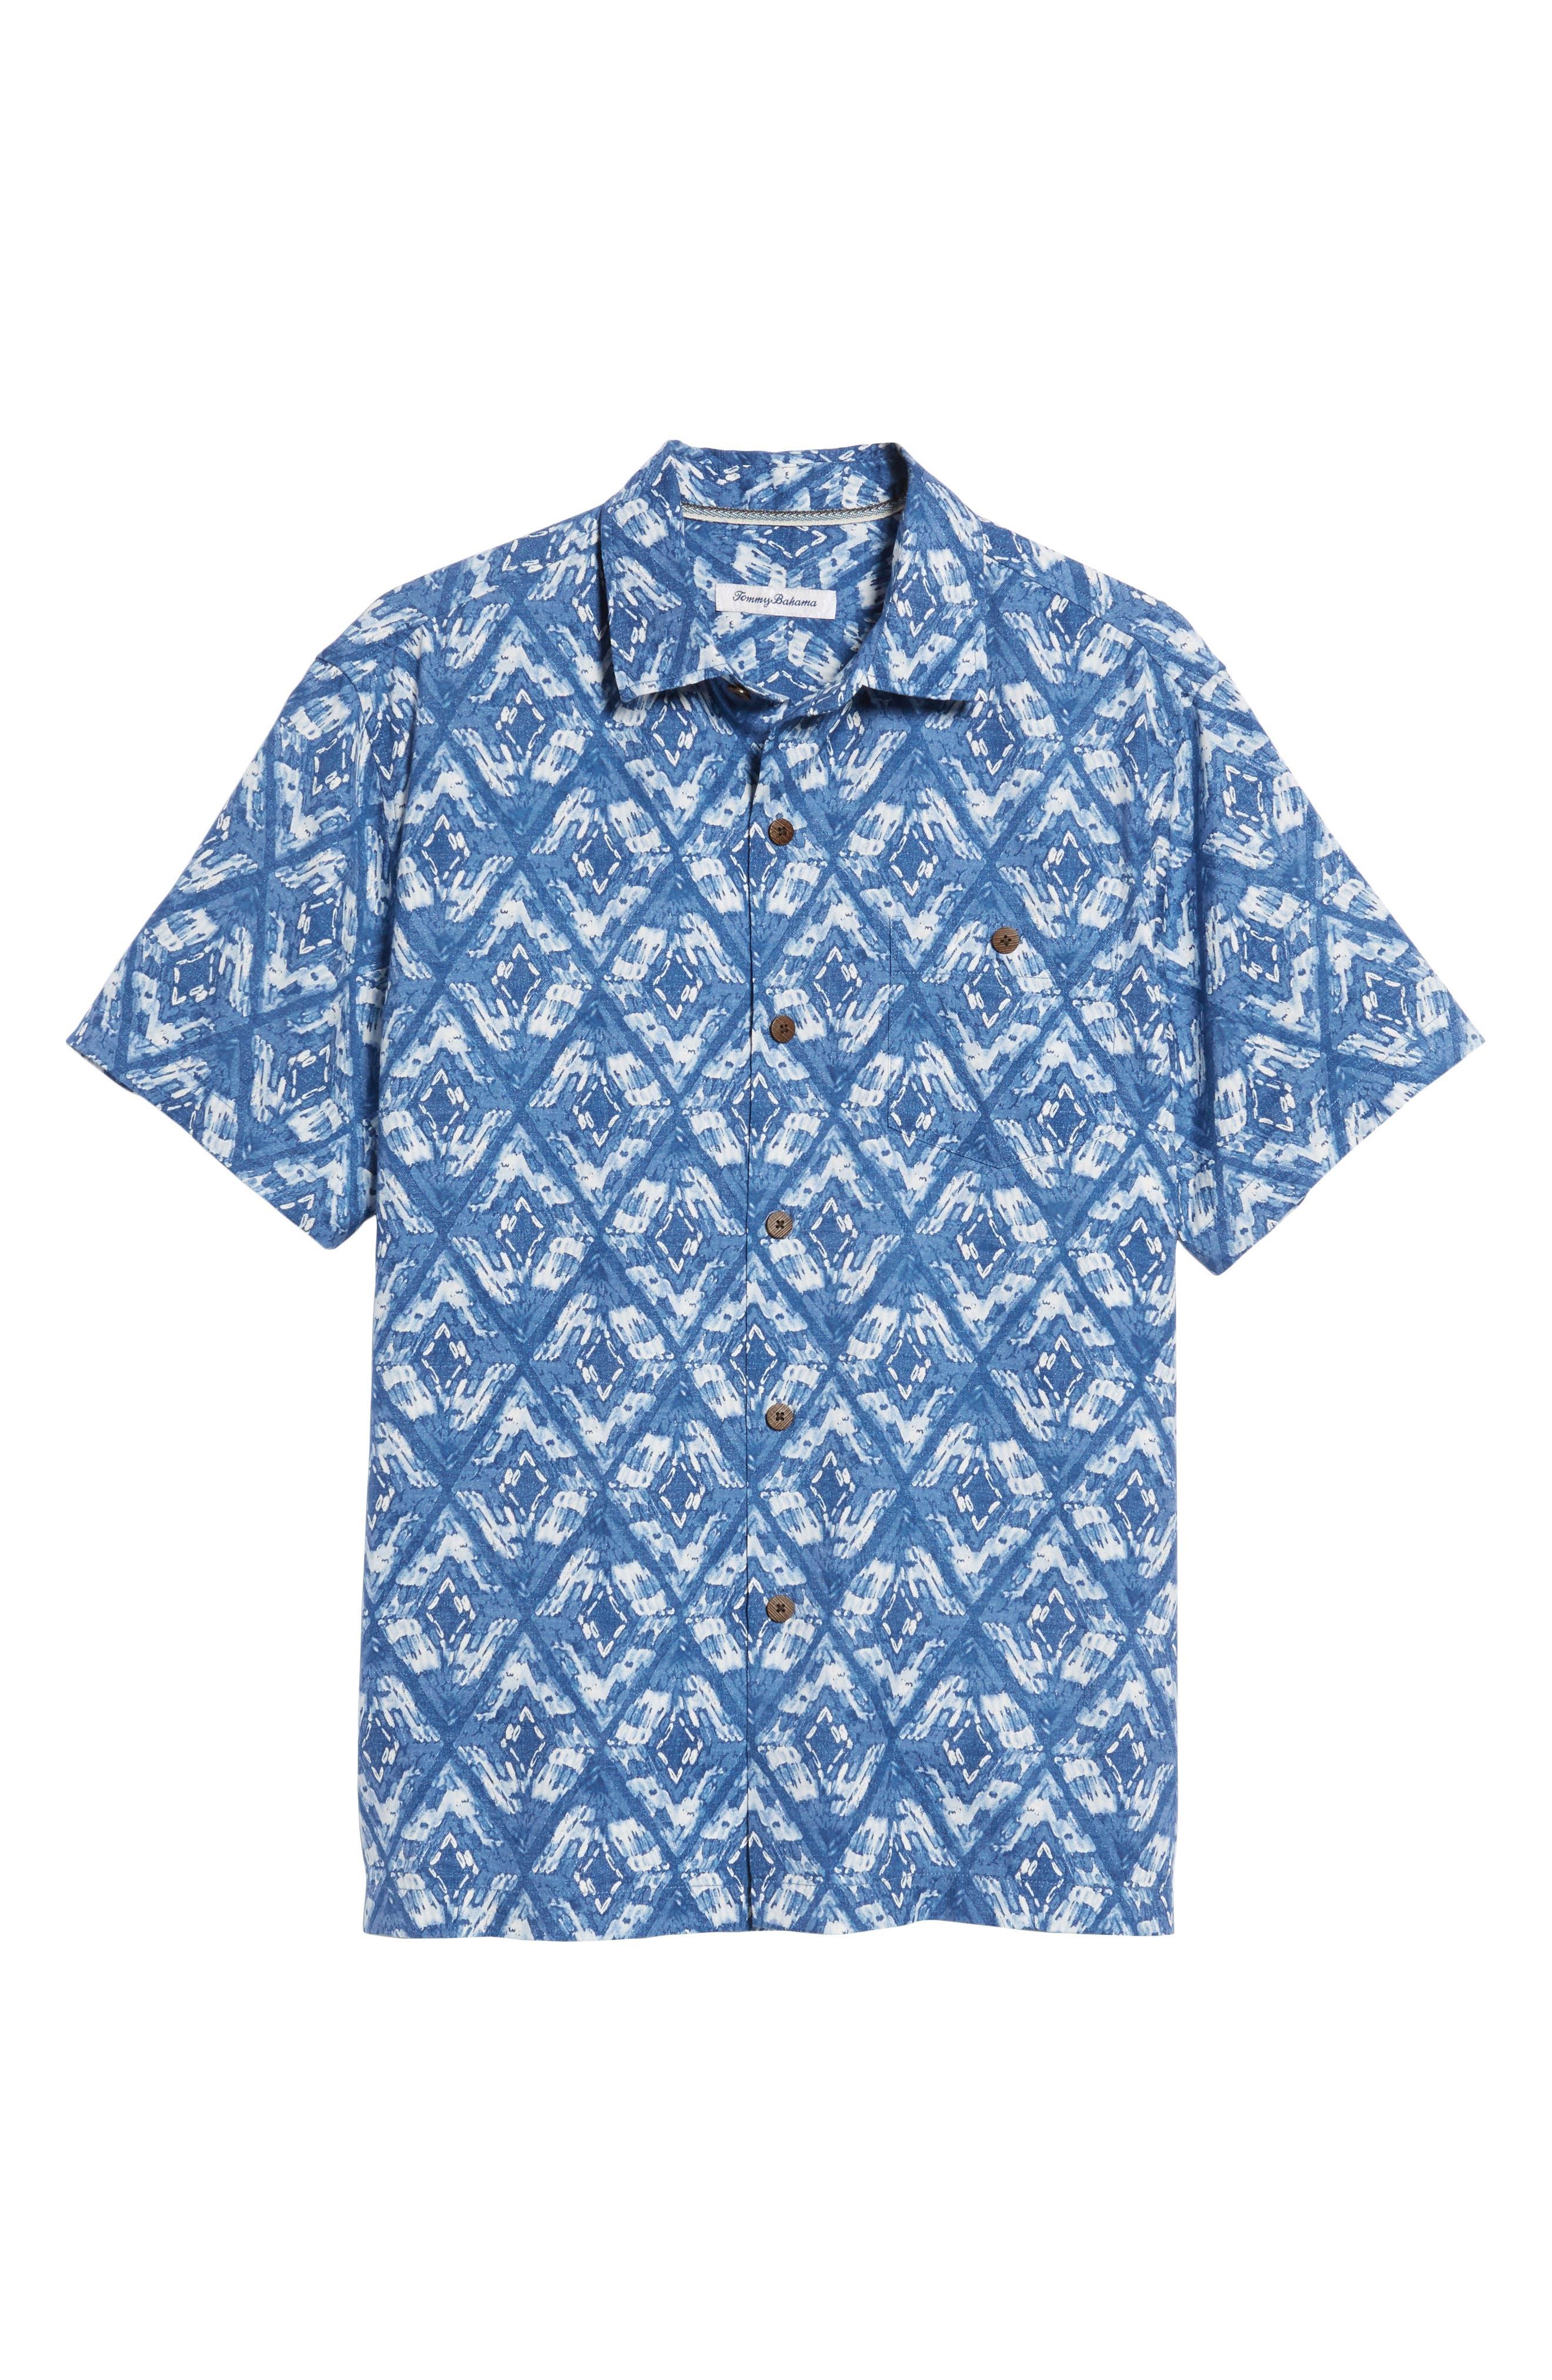 Deep Water Diamond Camp Shirt,                             Alternate thumbnail 6, color,                             400